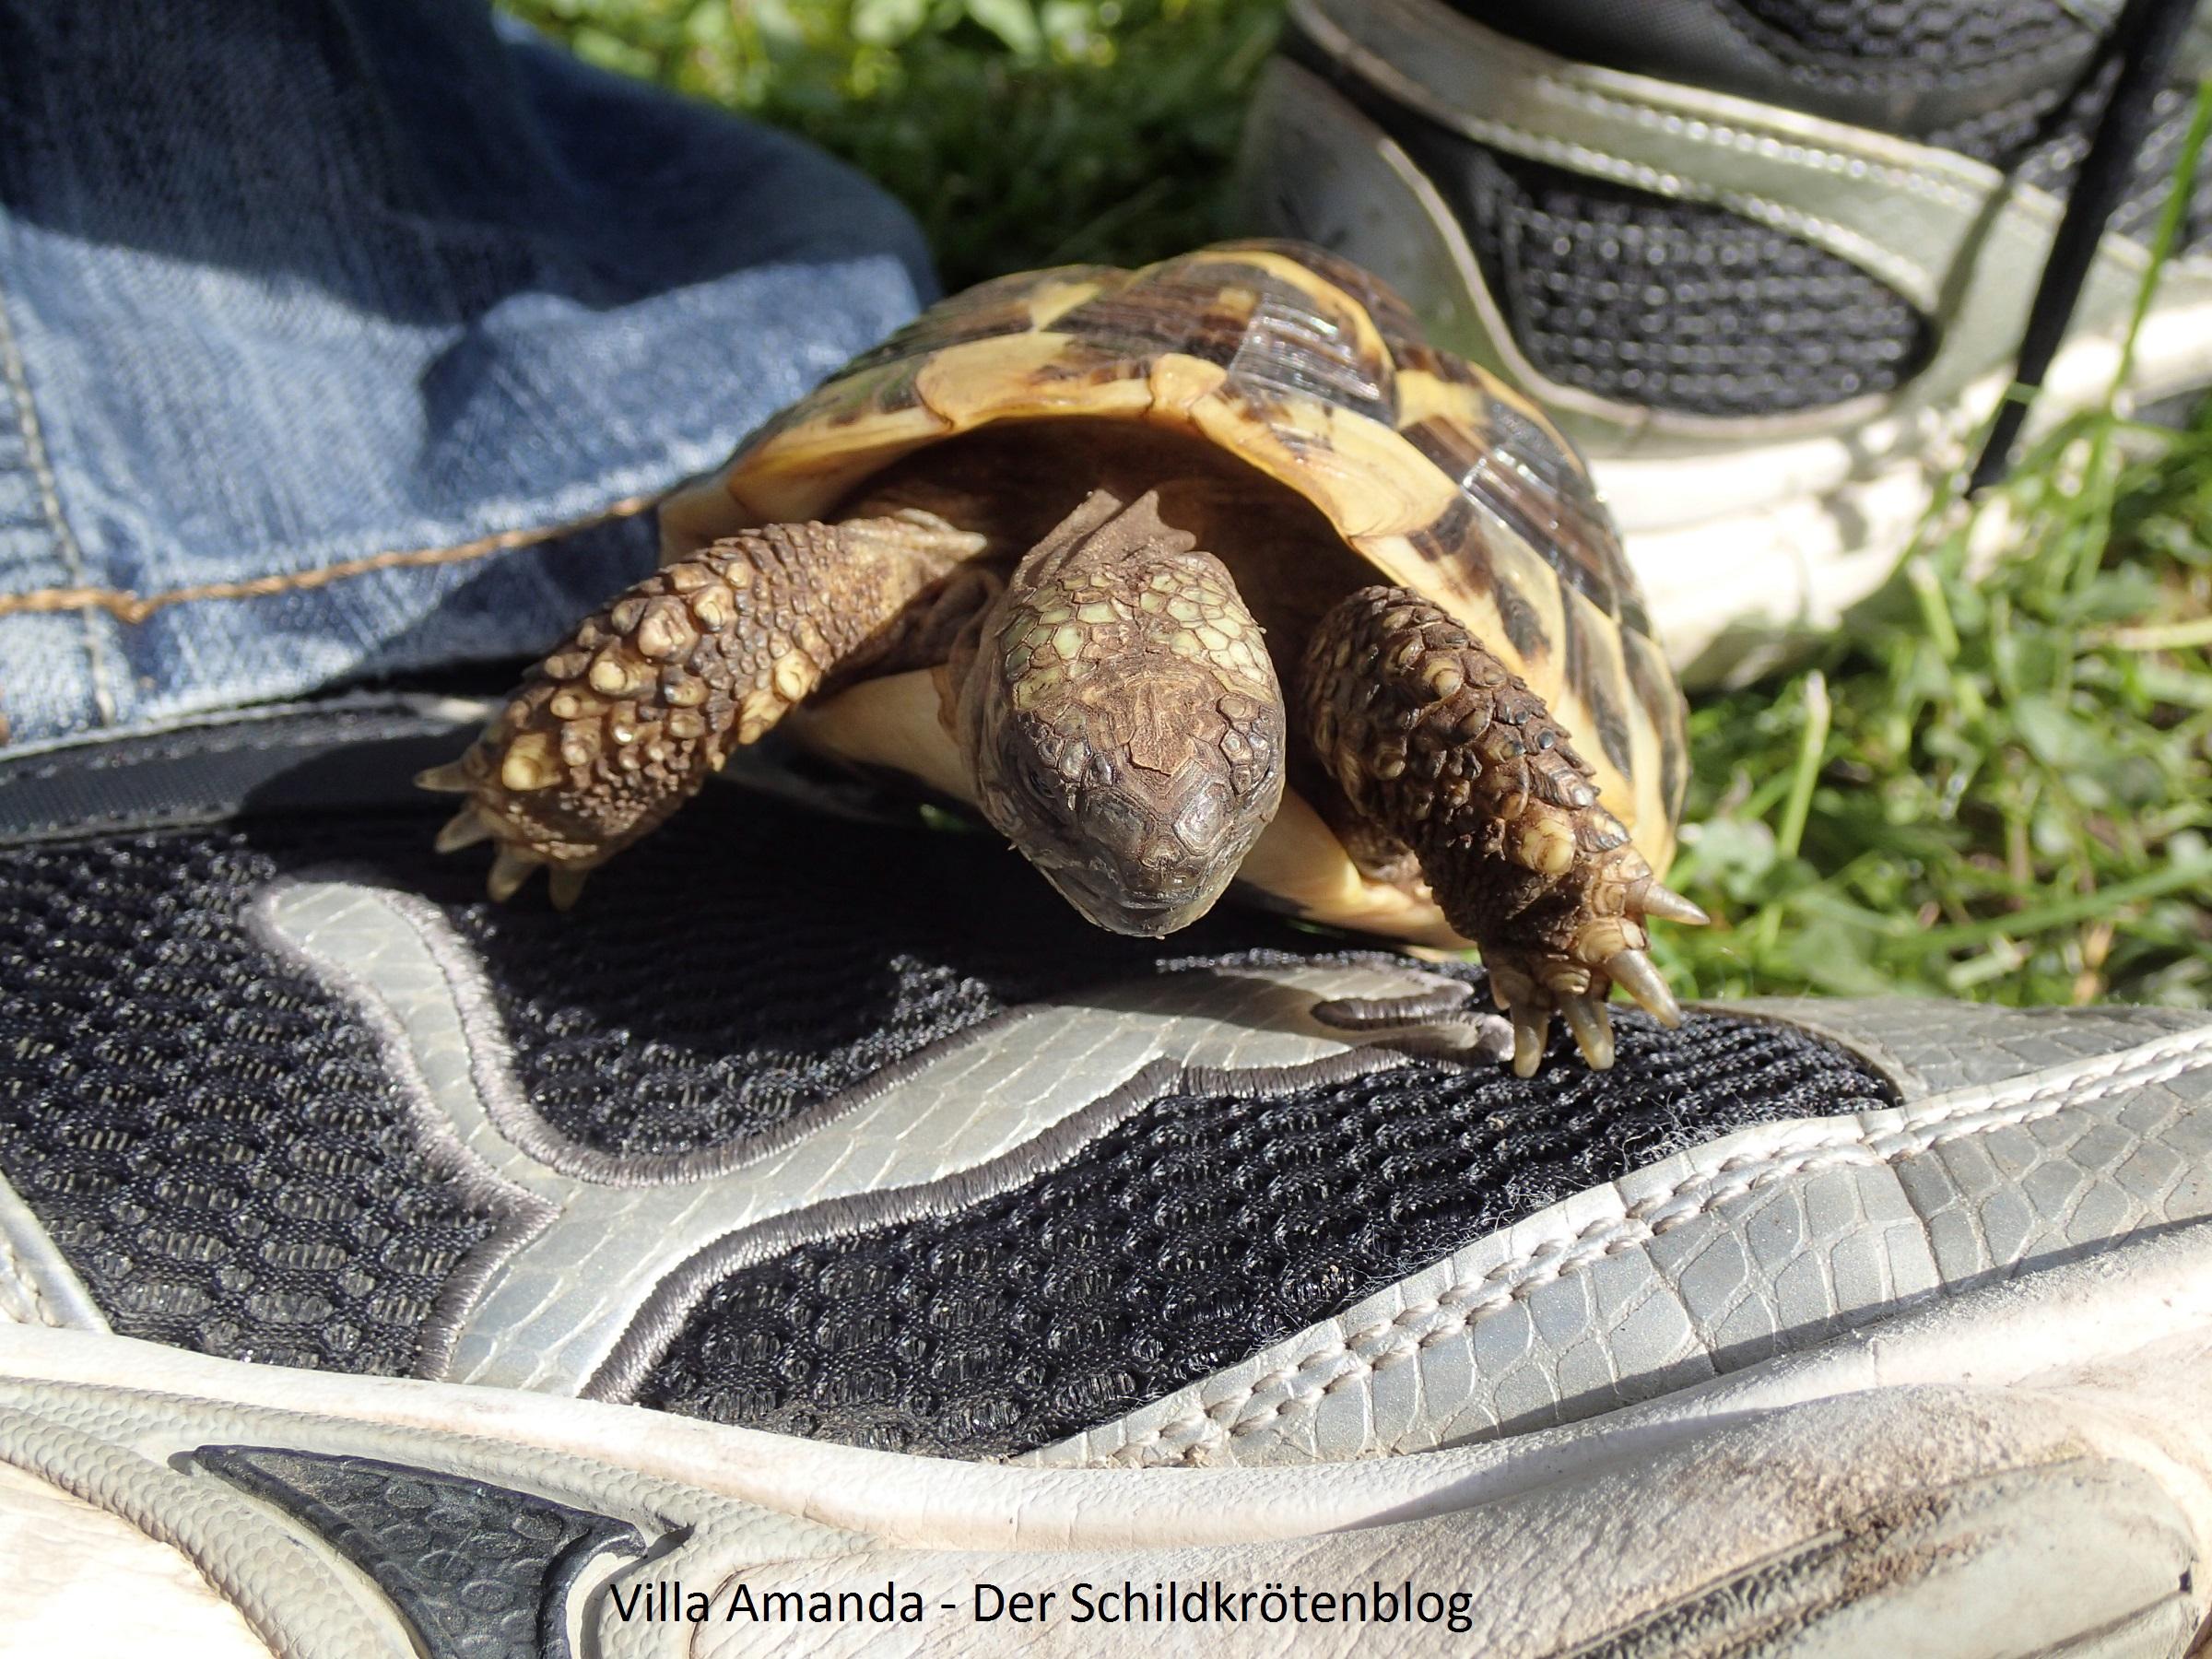 griechische Landschildkröte klettert